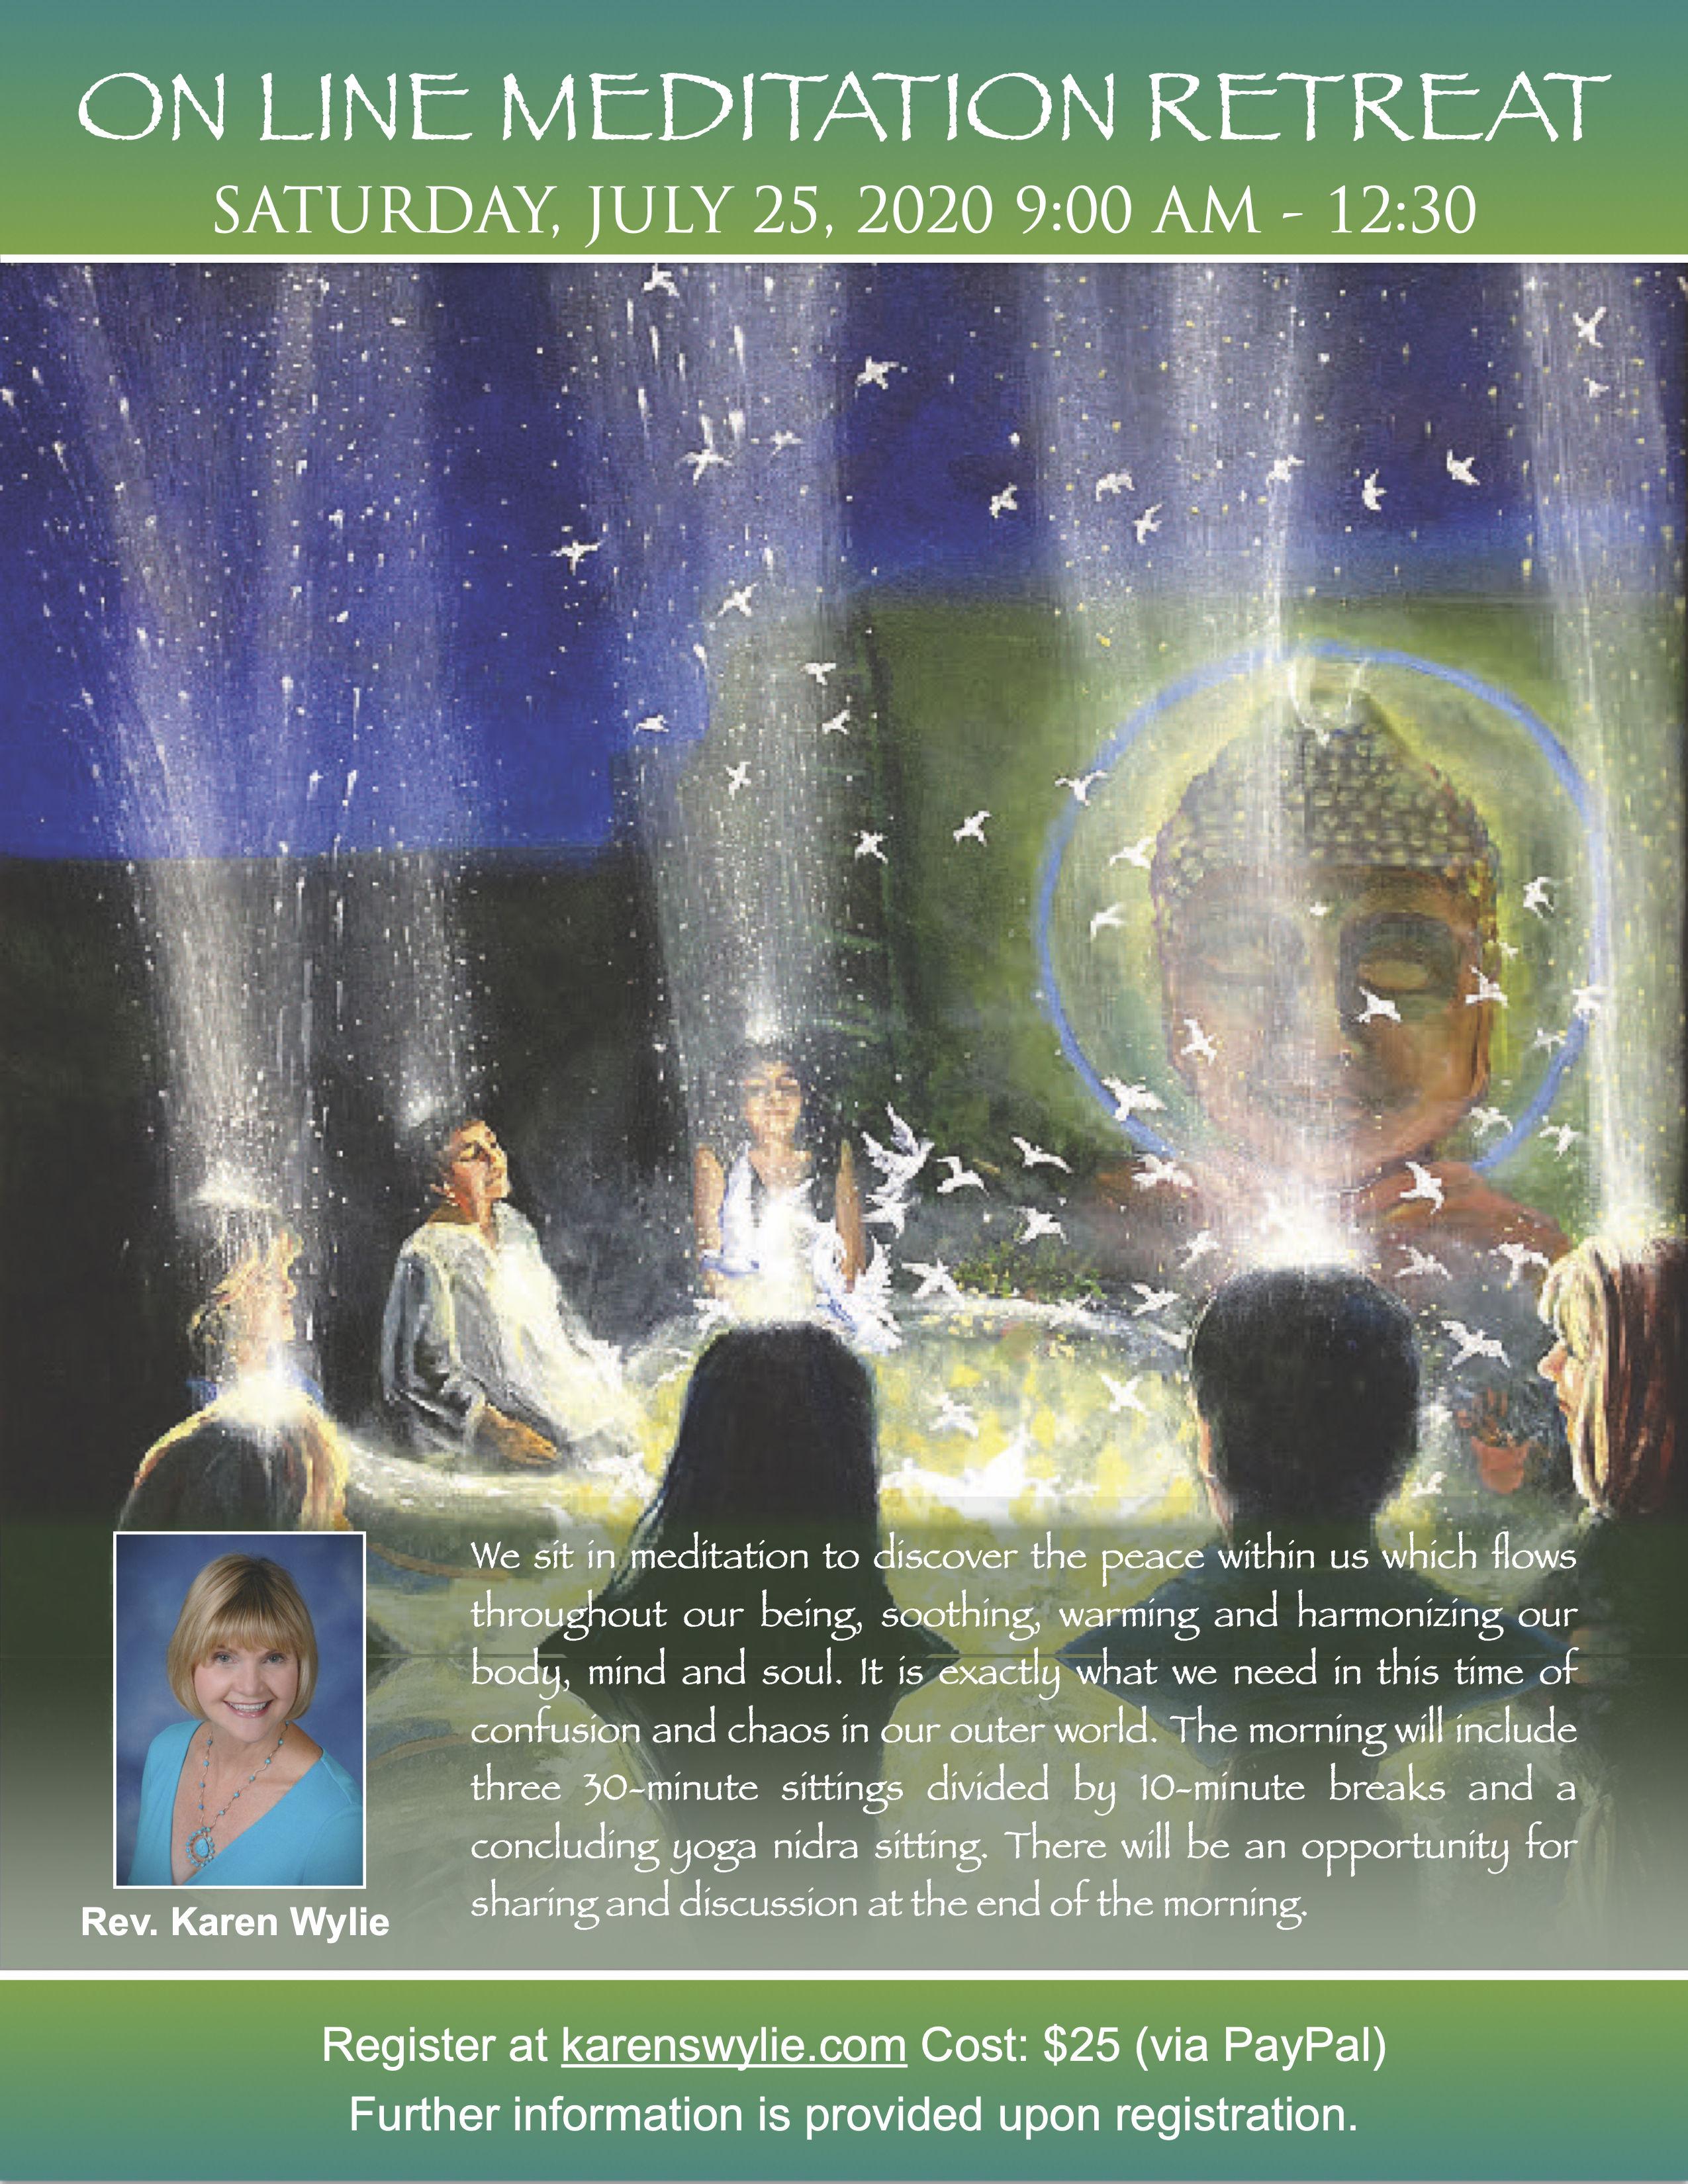 Rev. Karen S. Wylie's Online Meditation Retreat title=